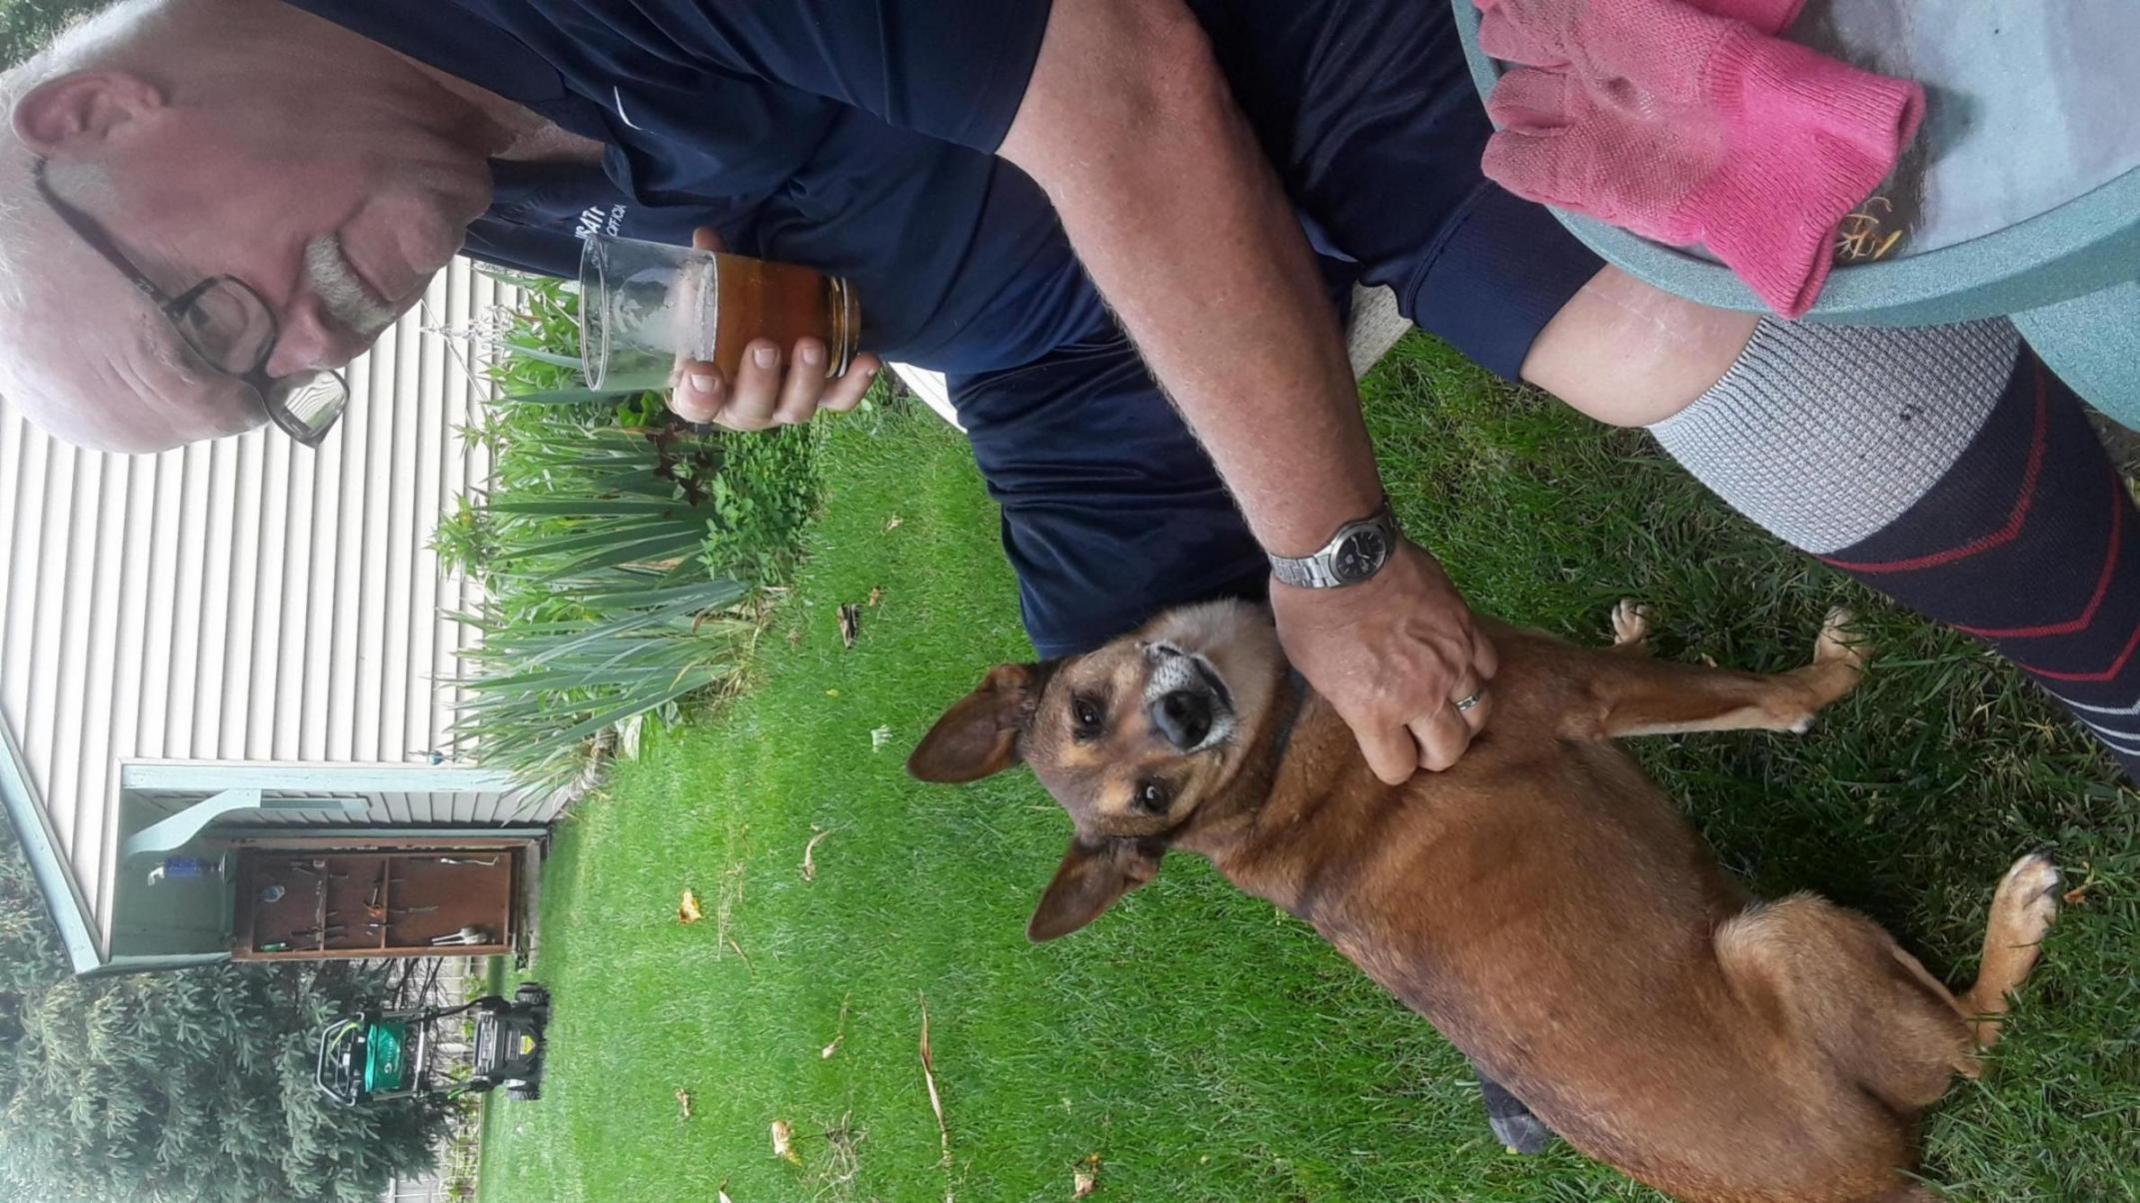 Need help with Possessive dog please-20190623_134354_1566515132684.jpg